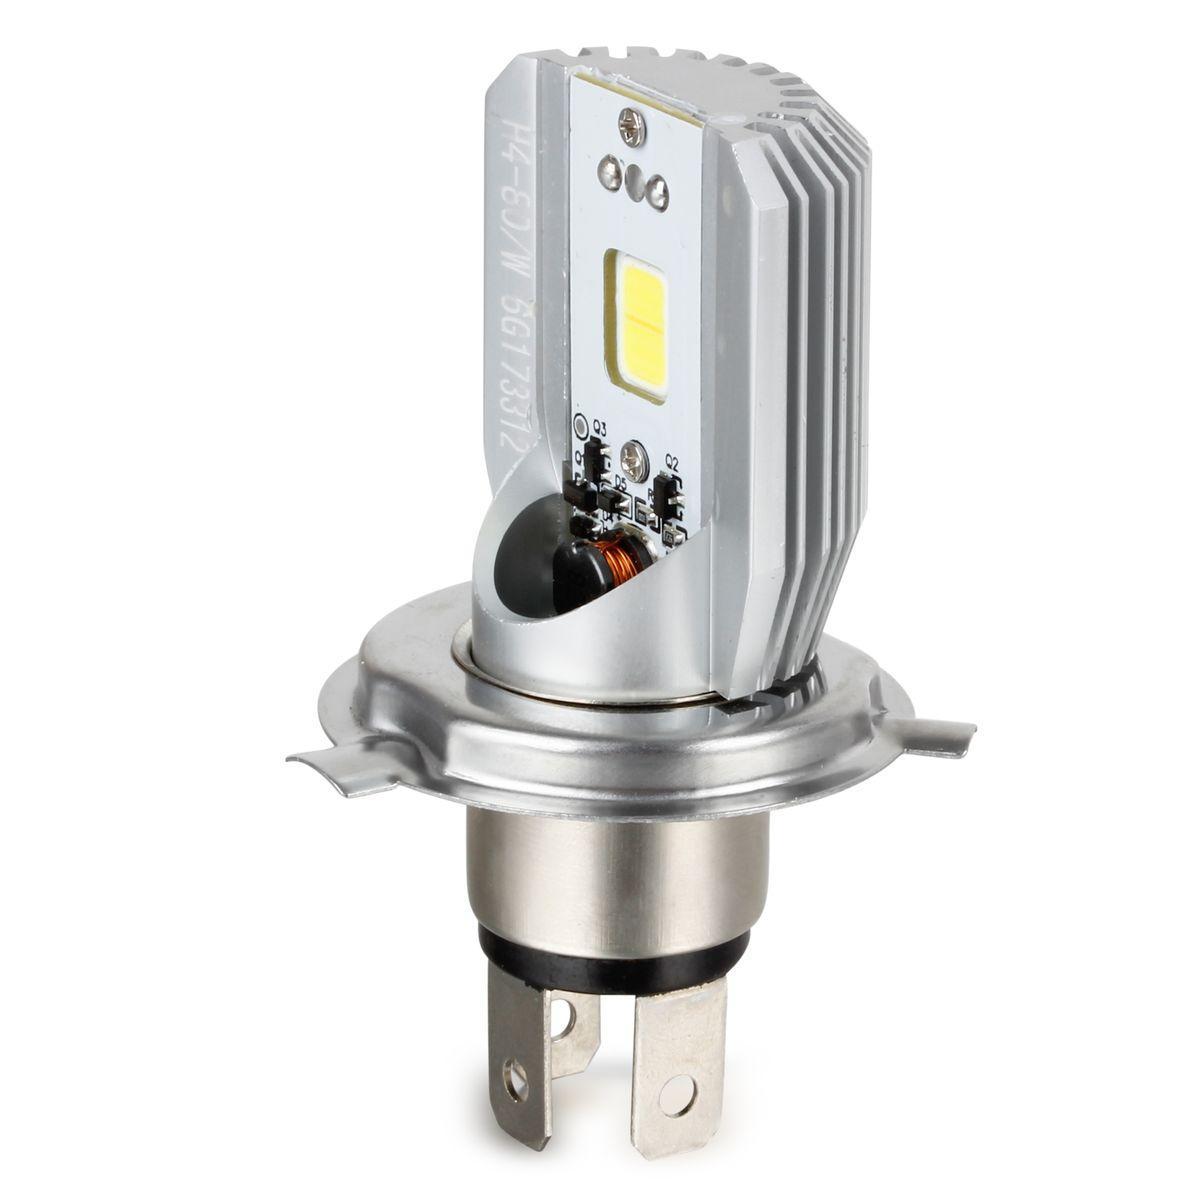 1x h4 motorcycle 6500k led hi lo beam headlight front light bulb lamp for honda ebay. Black Bedroom Furniture Sets. Home Design Ideas